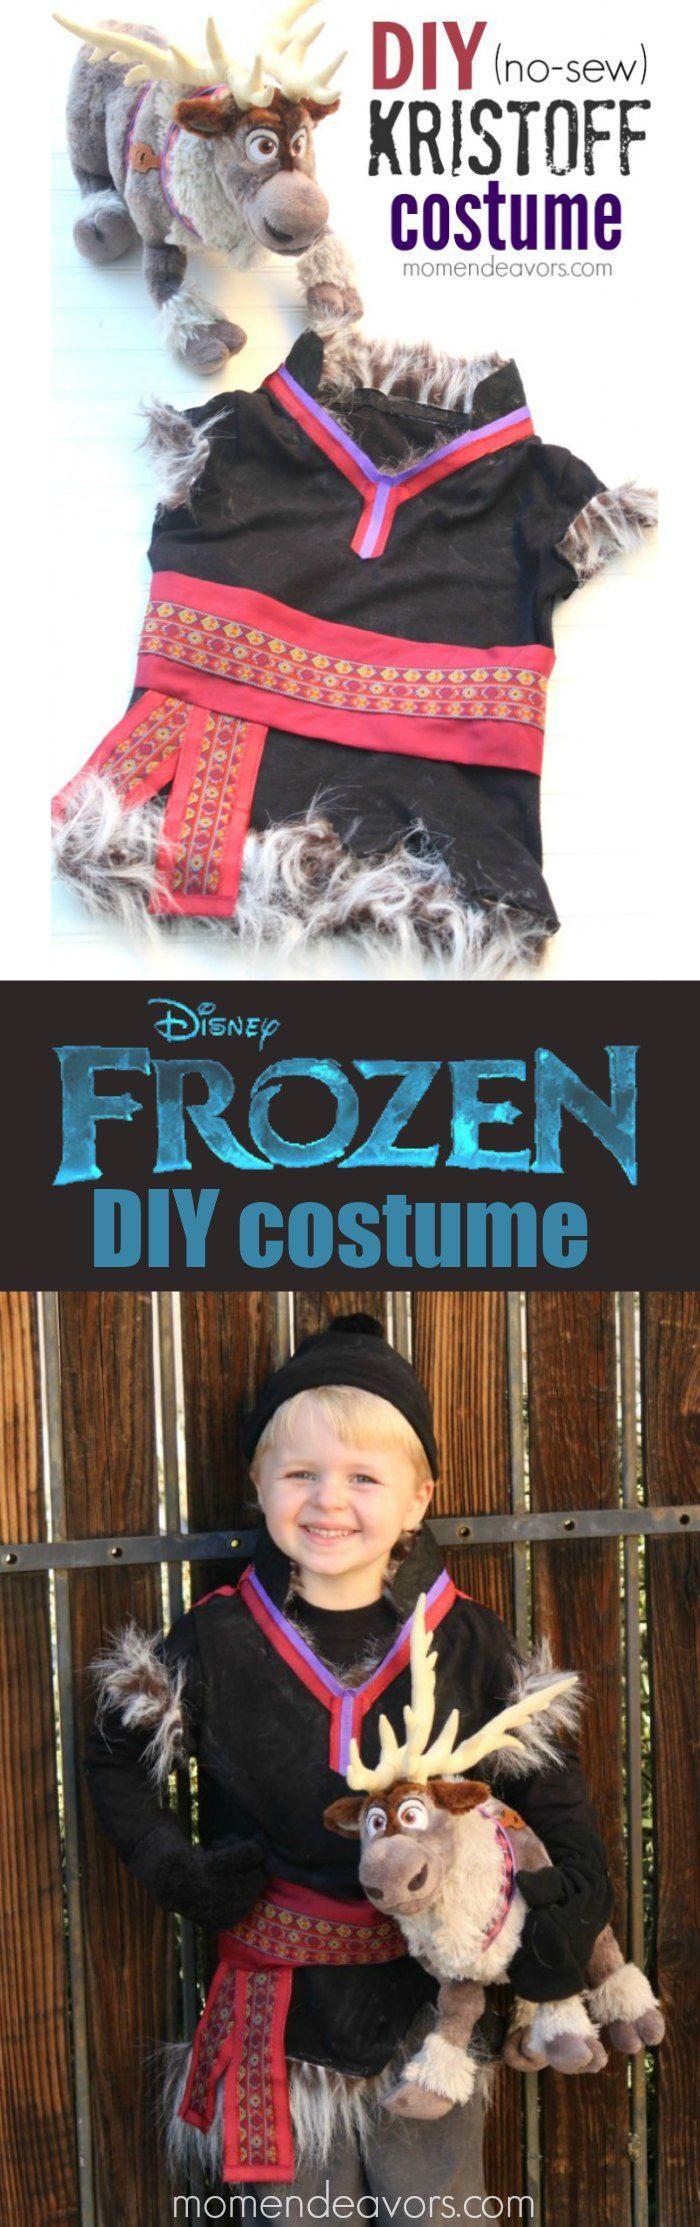 No-Sew DIY Disney FROZEN Kristoff Costume! Perfect Disney Halloween costume for boys!  sc 1 st  Pinterest & DIY No-Sew Disney Frozen Kristoff Costume | Pinterest | Disney ...